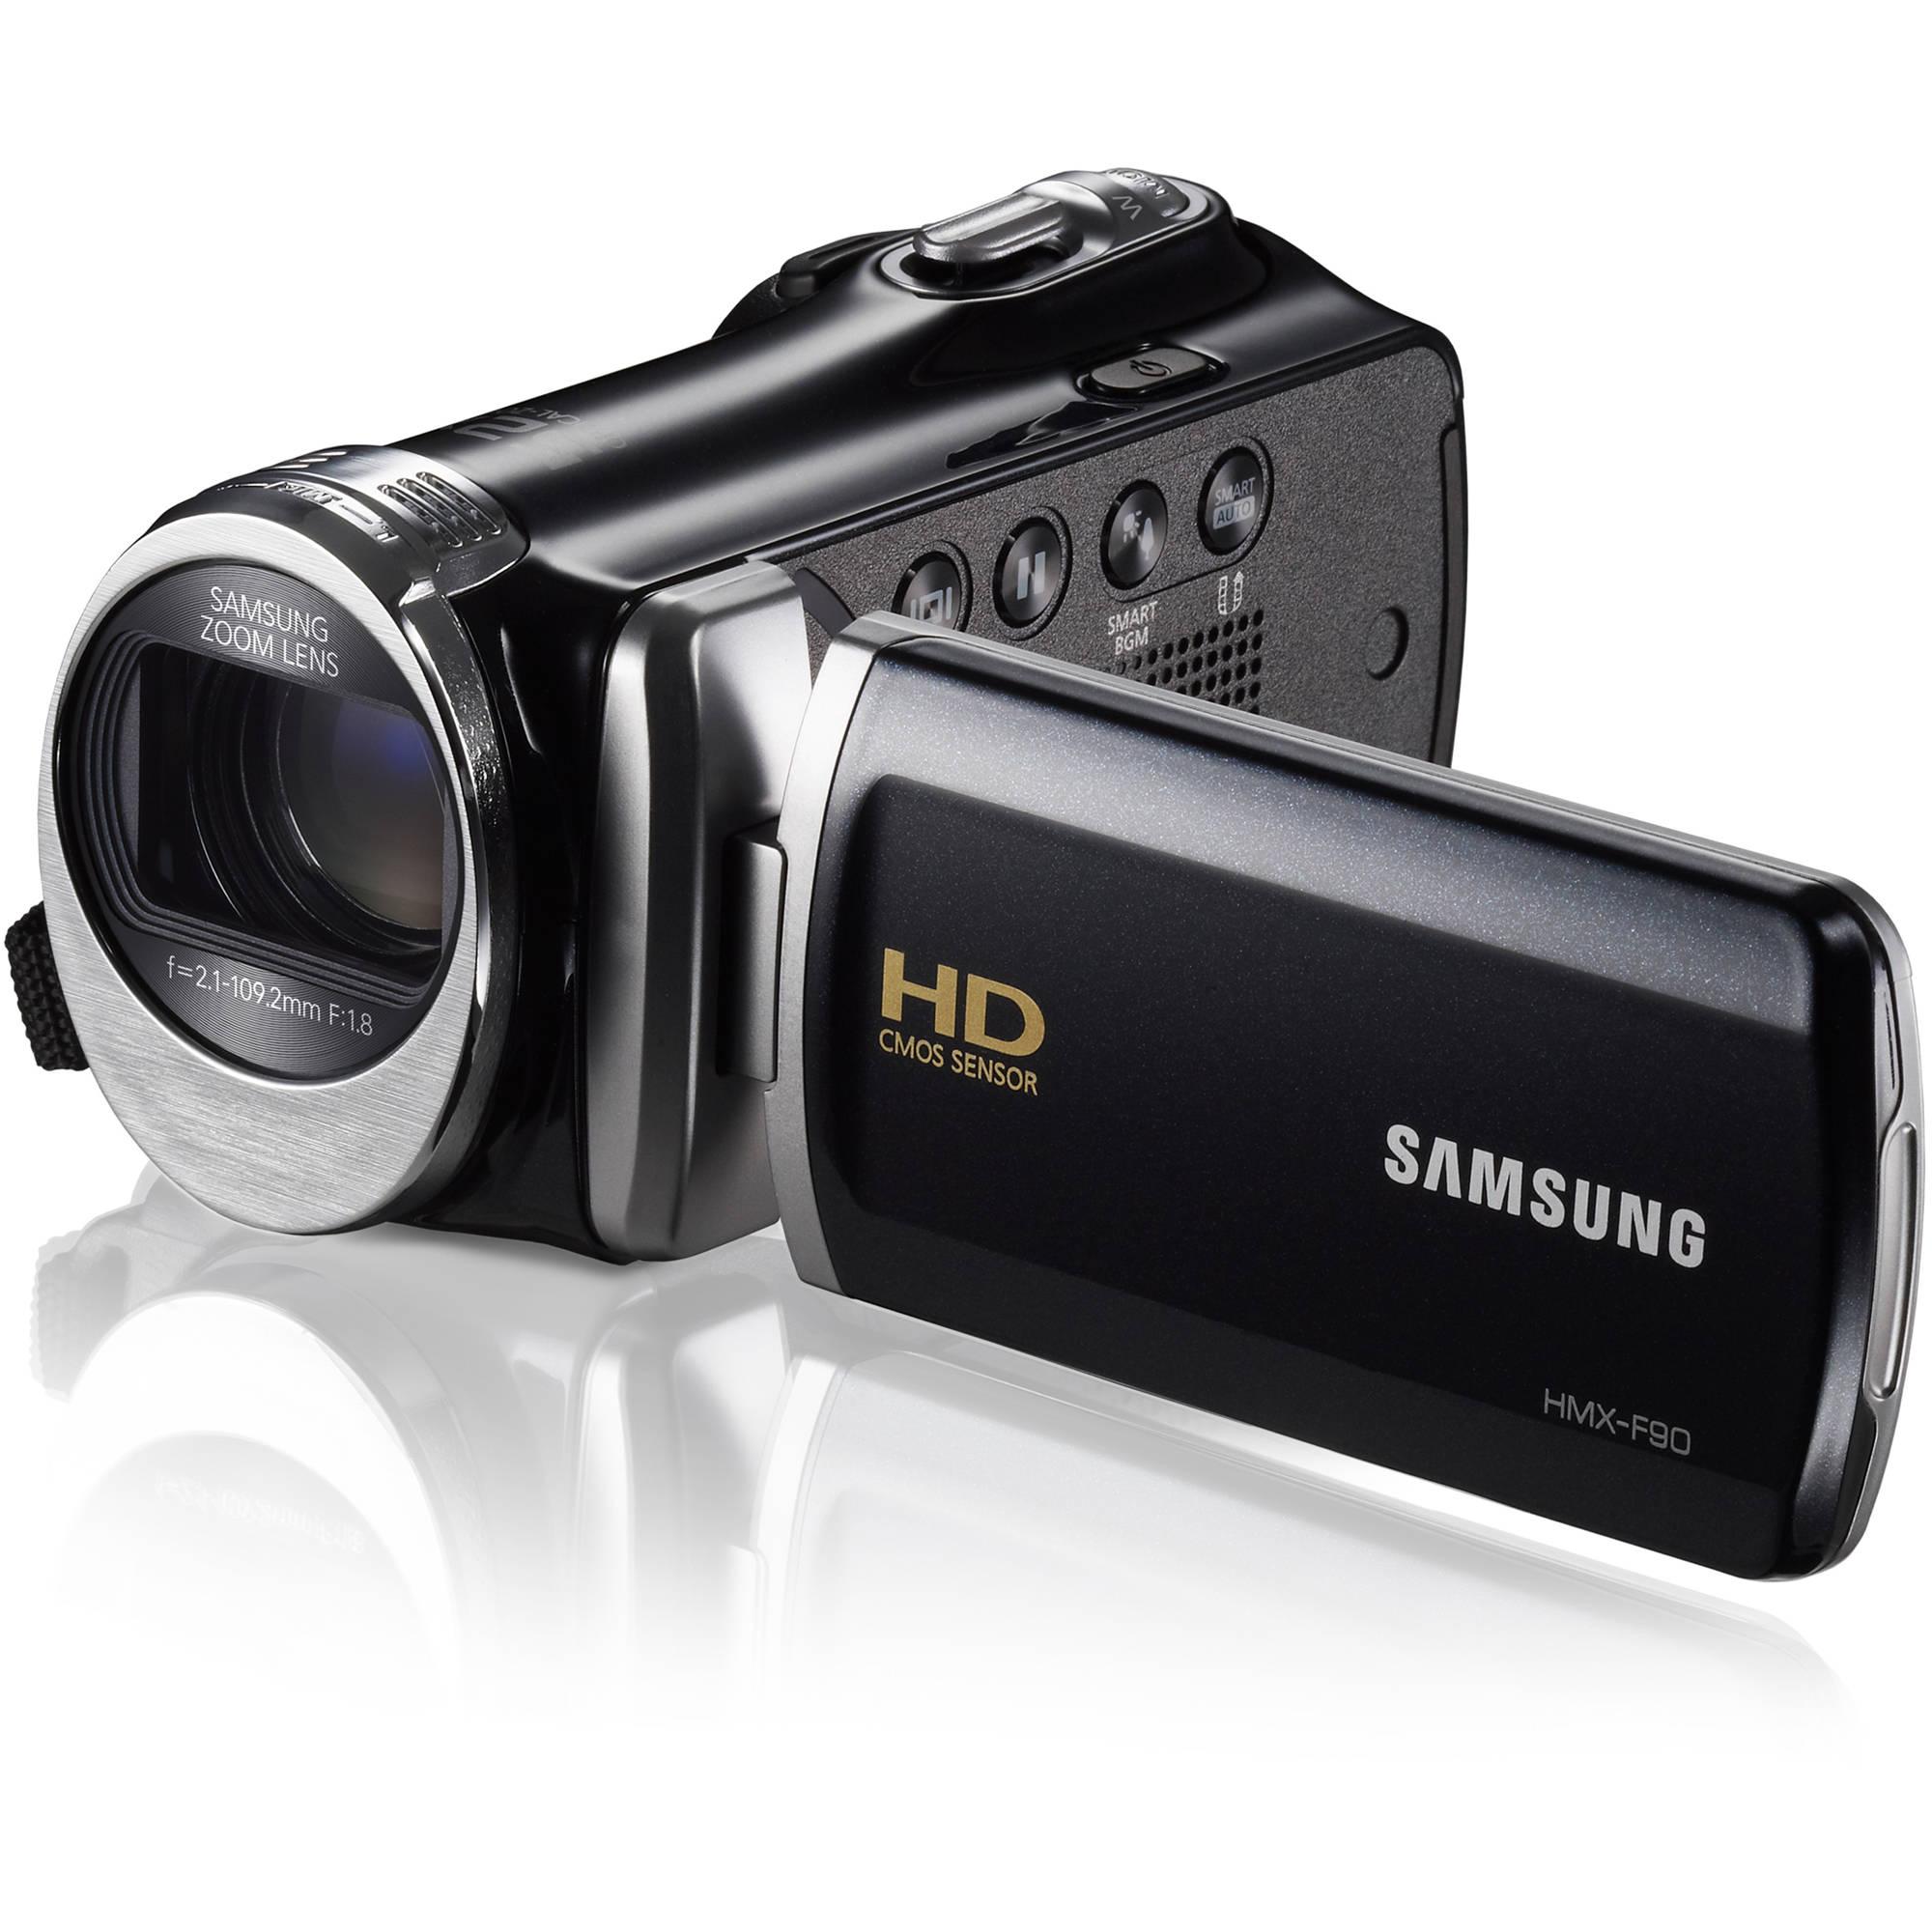 Samsung Hmx F90 Hd Camcorder Black Hmx F90bn Xaa B H Photo